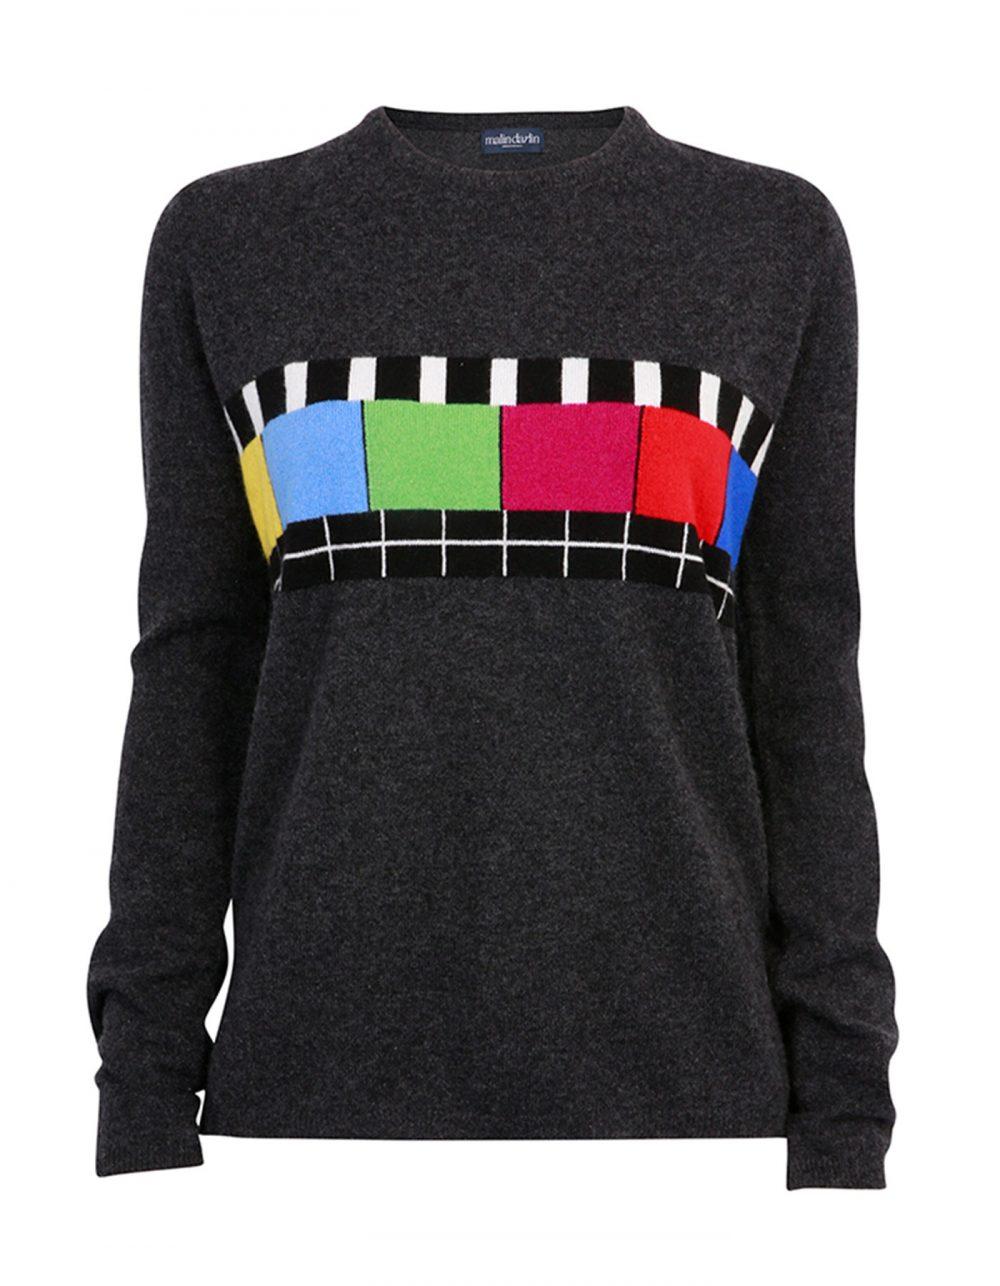 Designer knitwear, the malin darlin Test Bild charcoal cashmere jumper, laid flat on a white background.